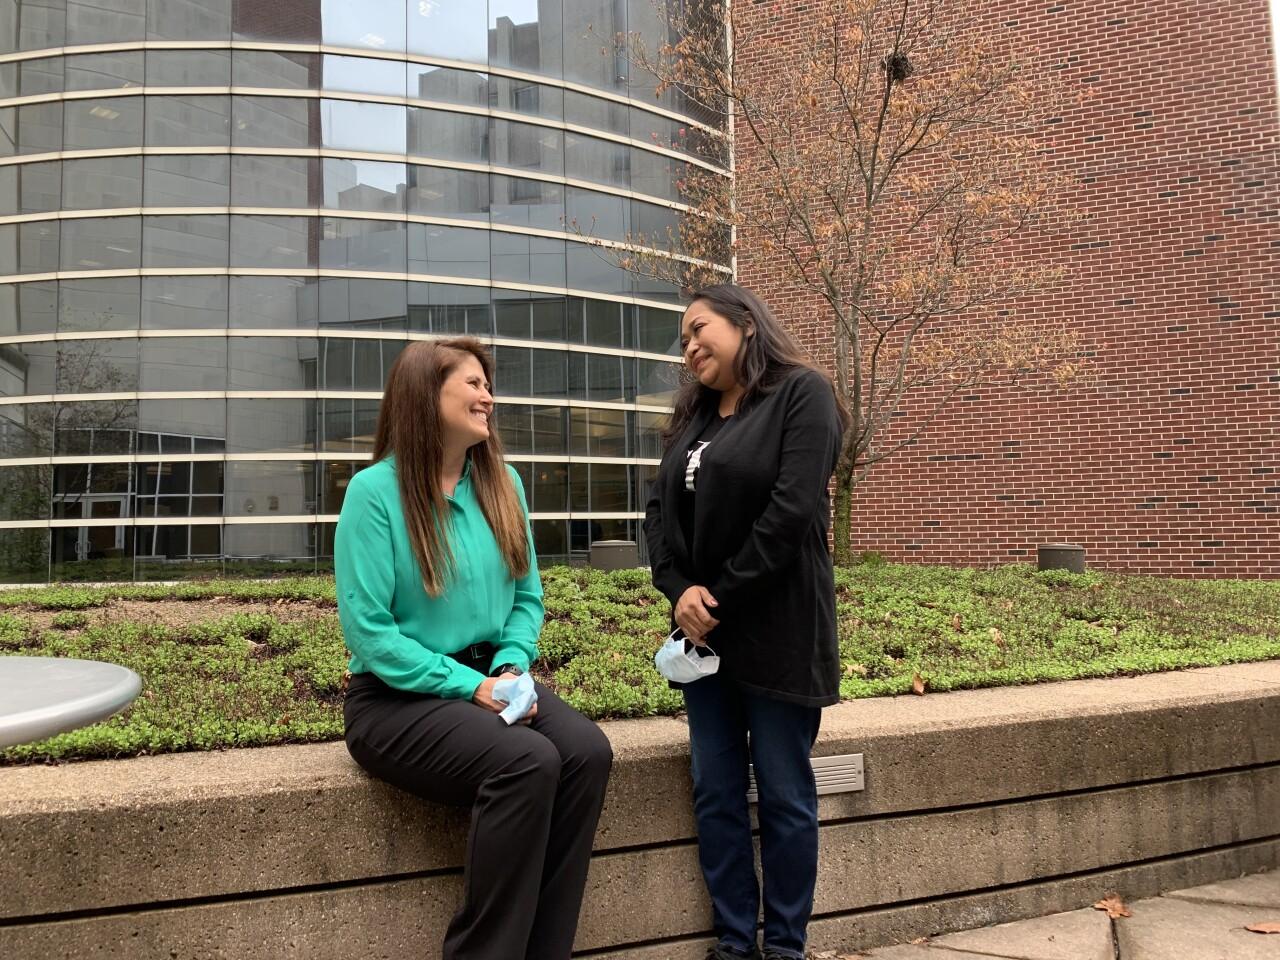 Stephanie Meeting Her Liver Recipient. CREDIT: IU HEALTH